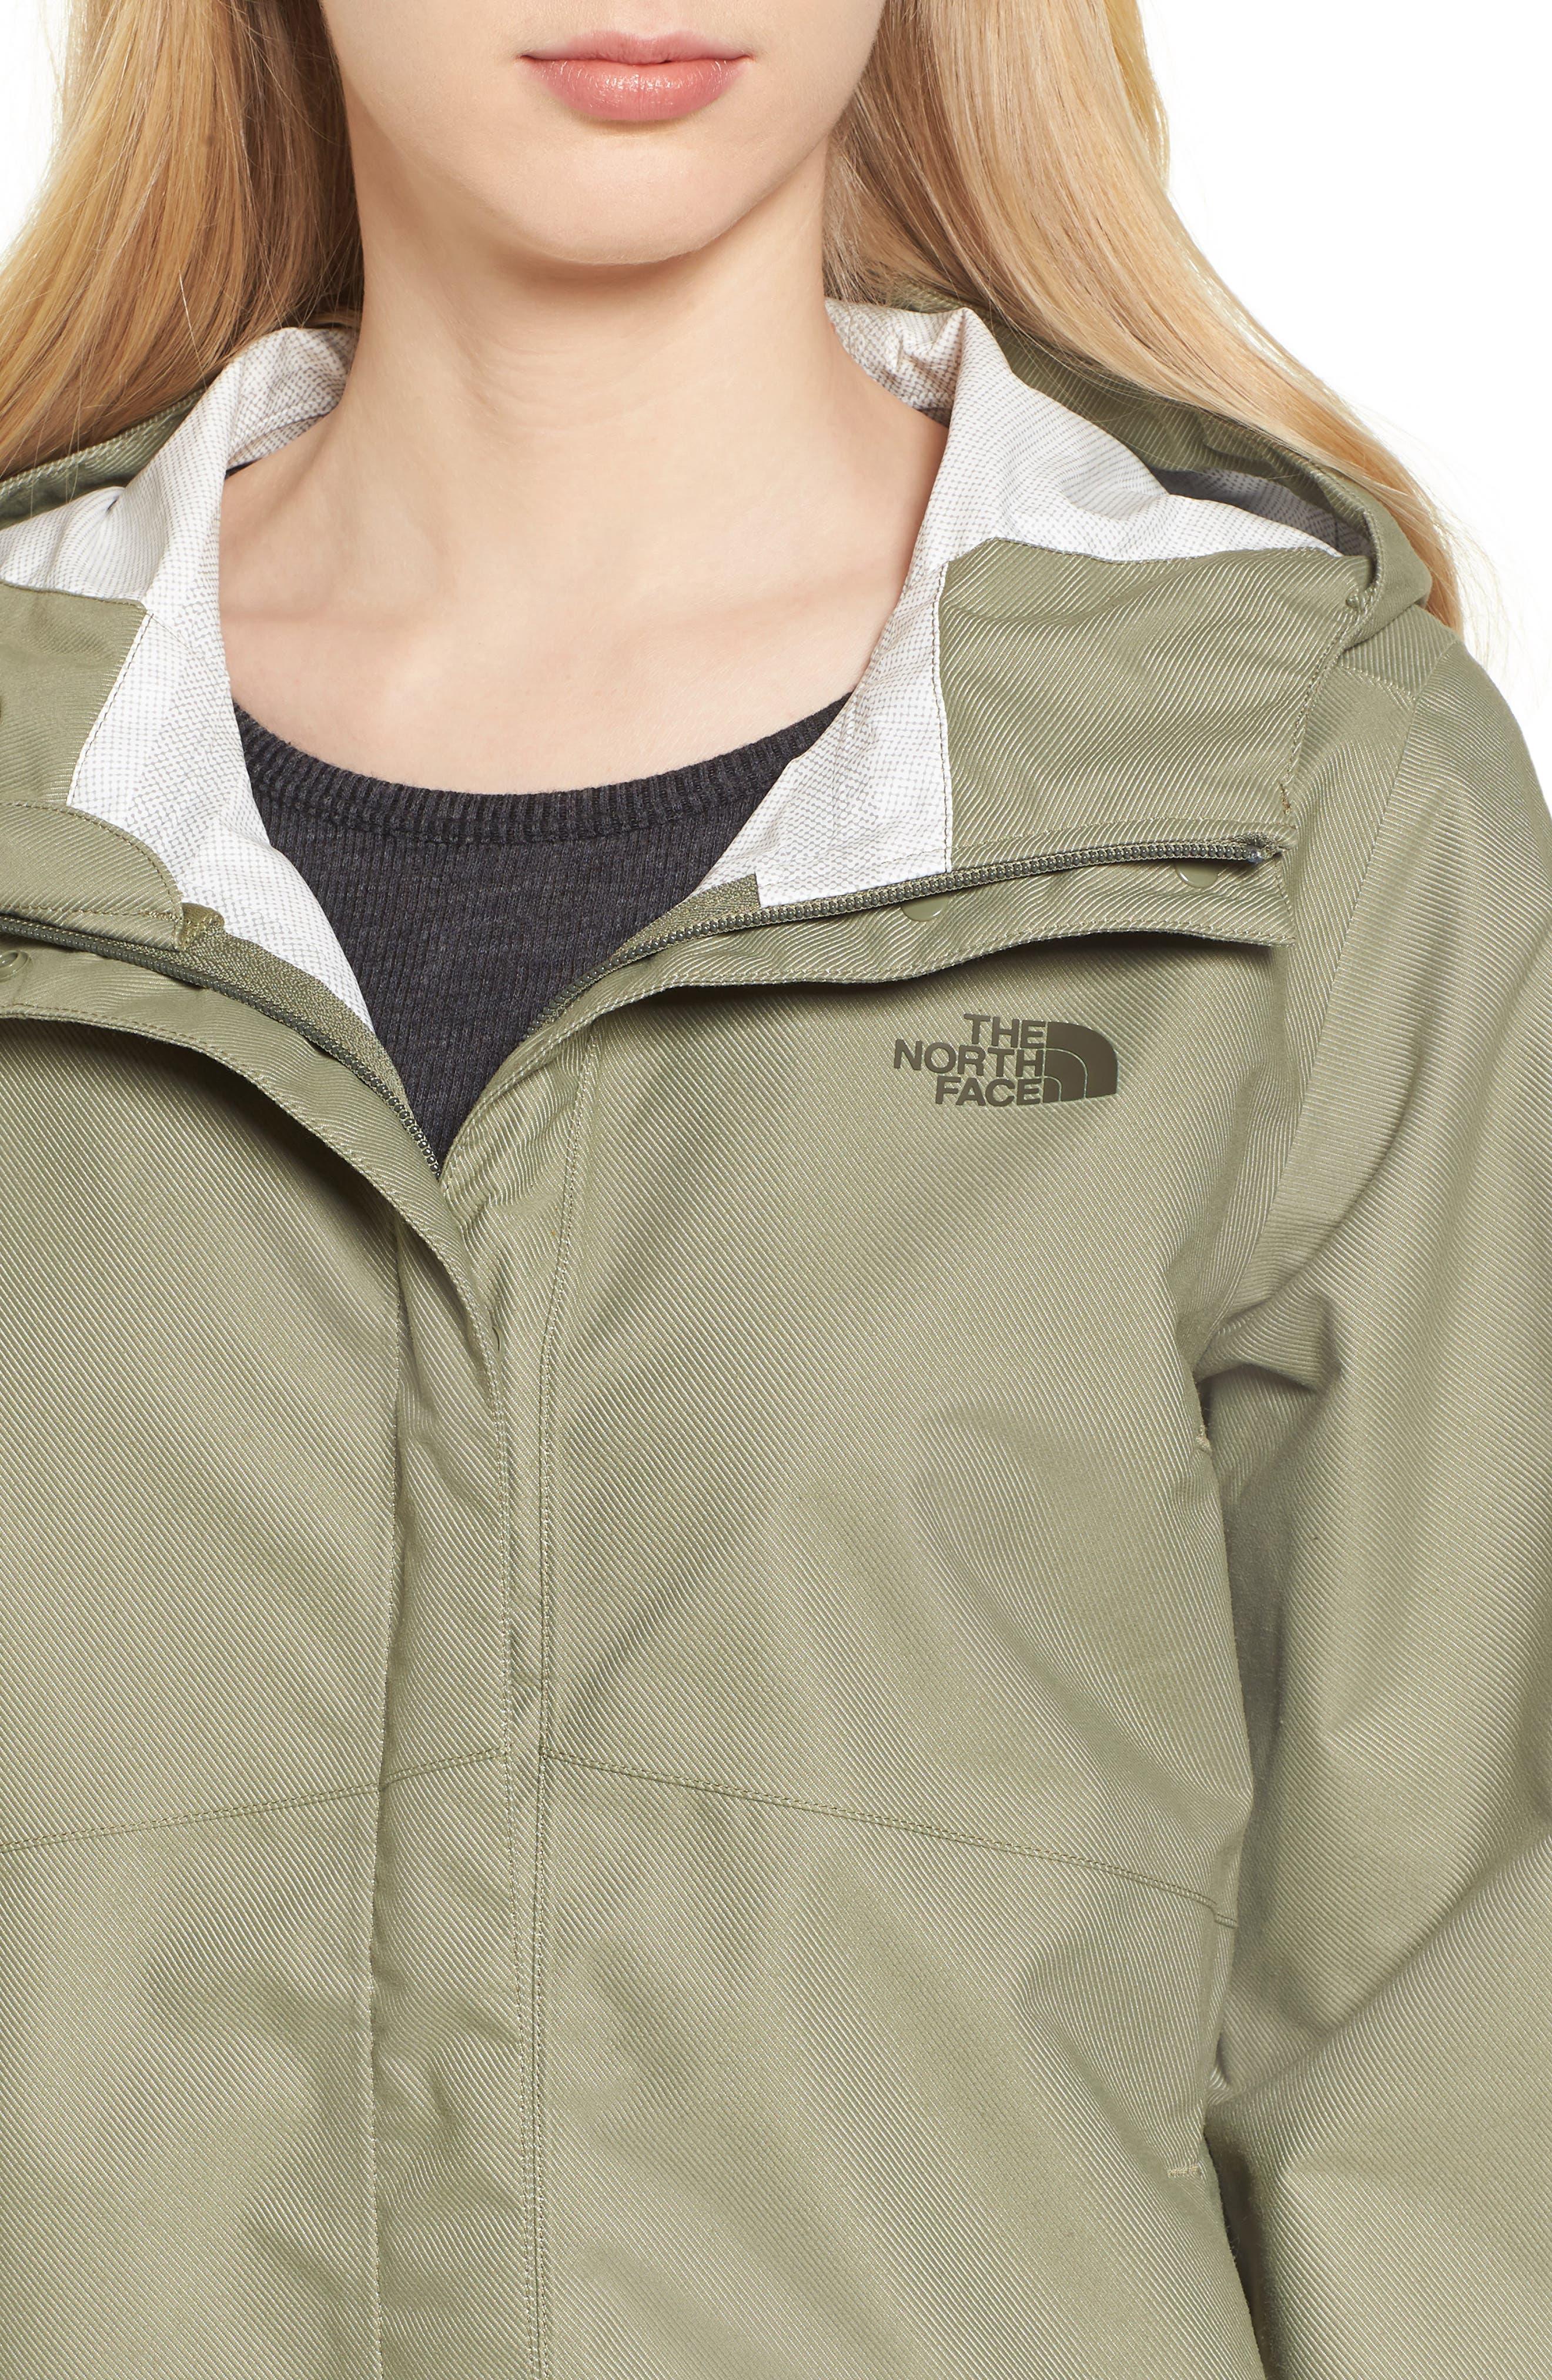 Berrien Waterproof Jacket,                             Alternate thumbnail 4, color,                             Deep Lichen Green Denim